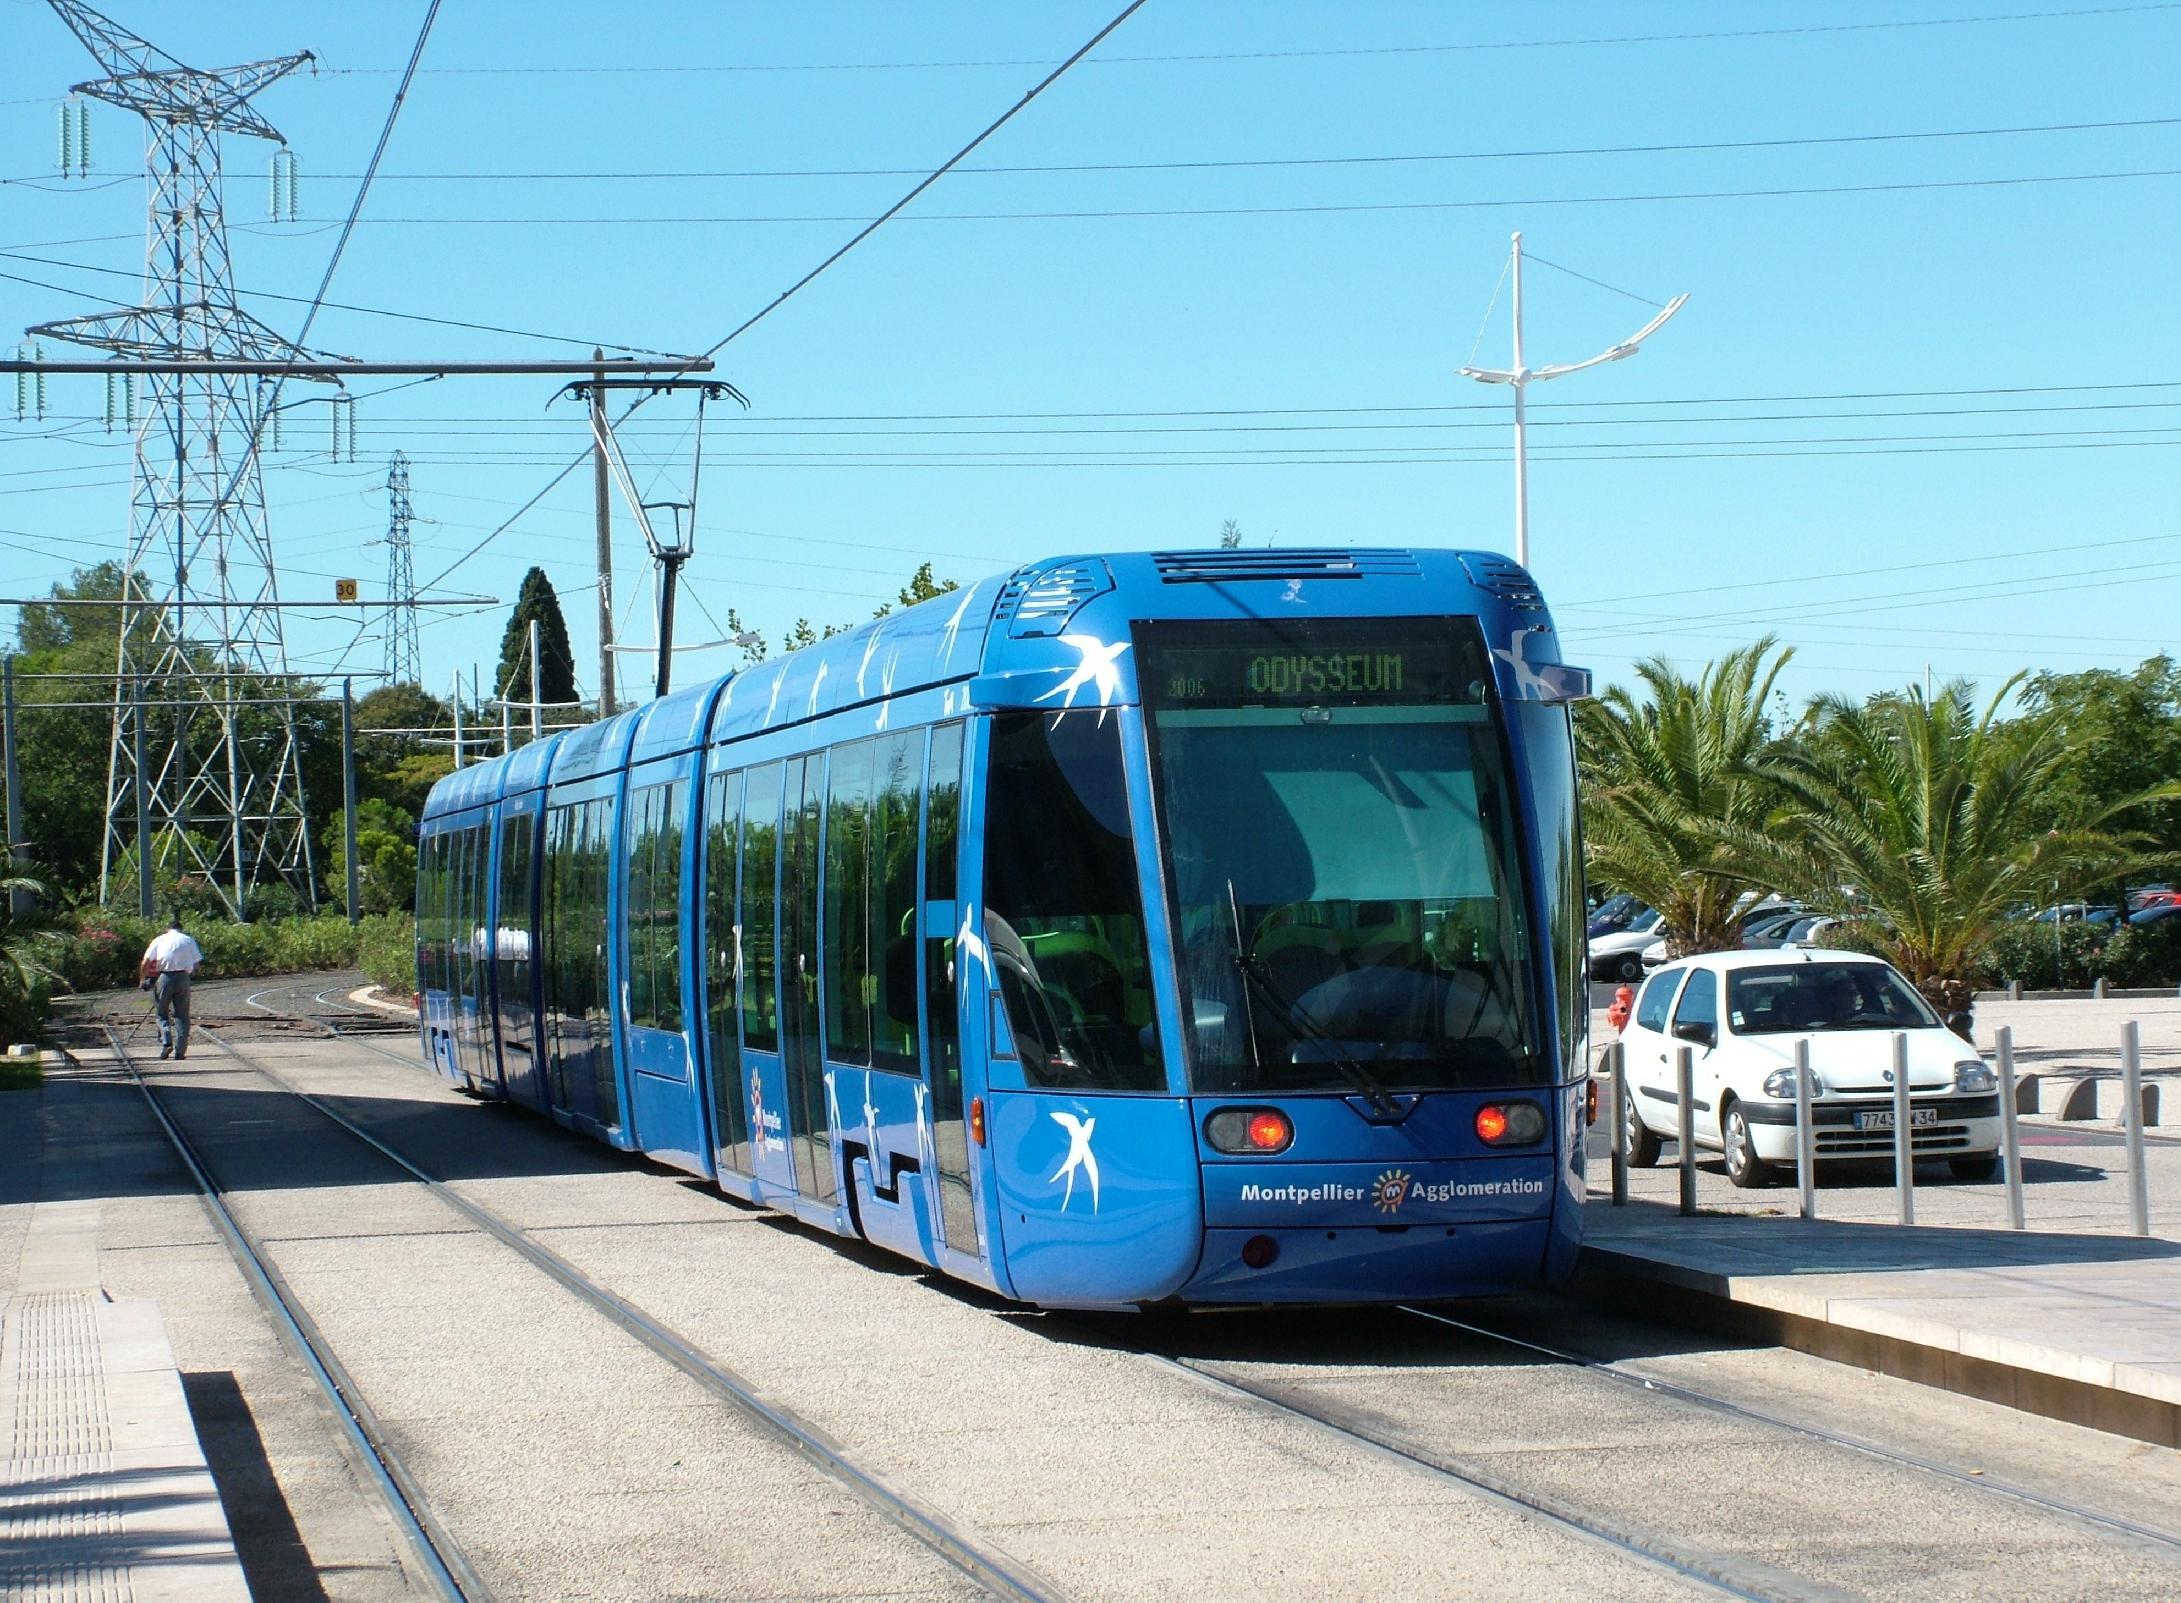 9 Alstom Citadis 401 Montpellier (3)_1.jpg